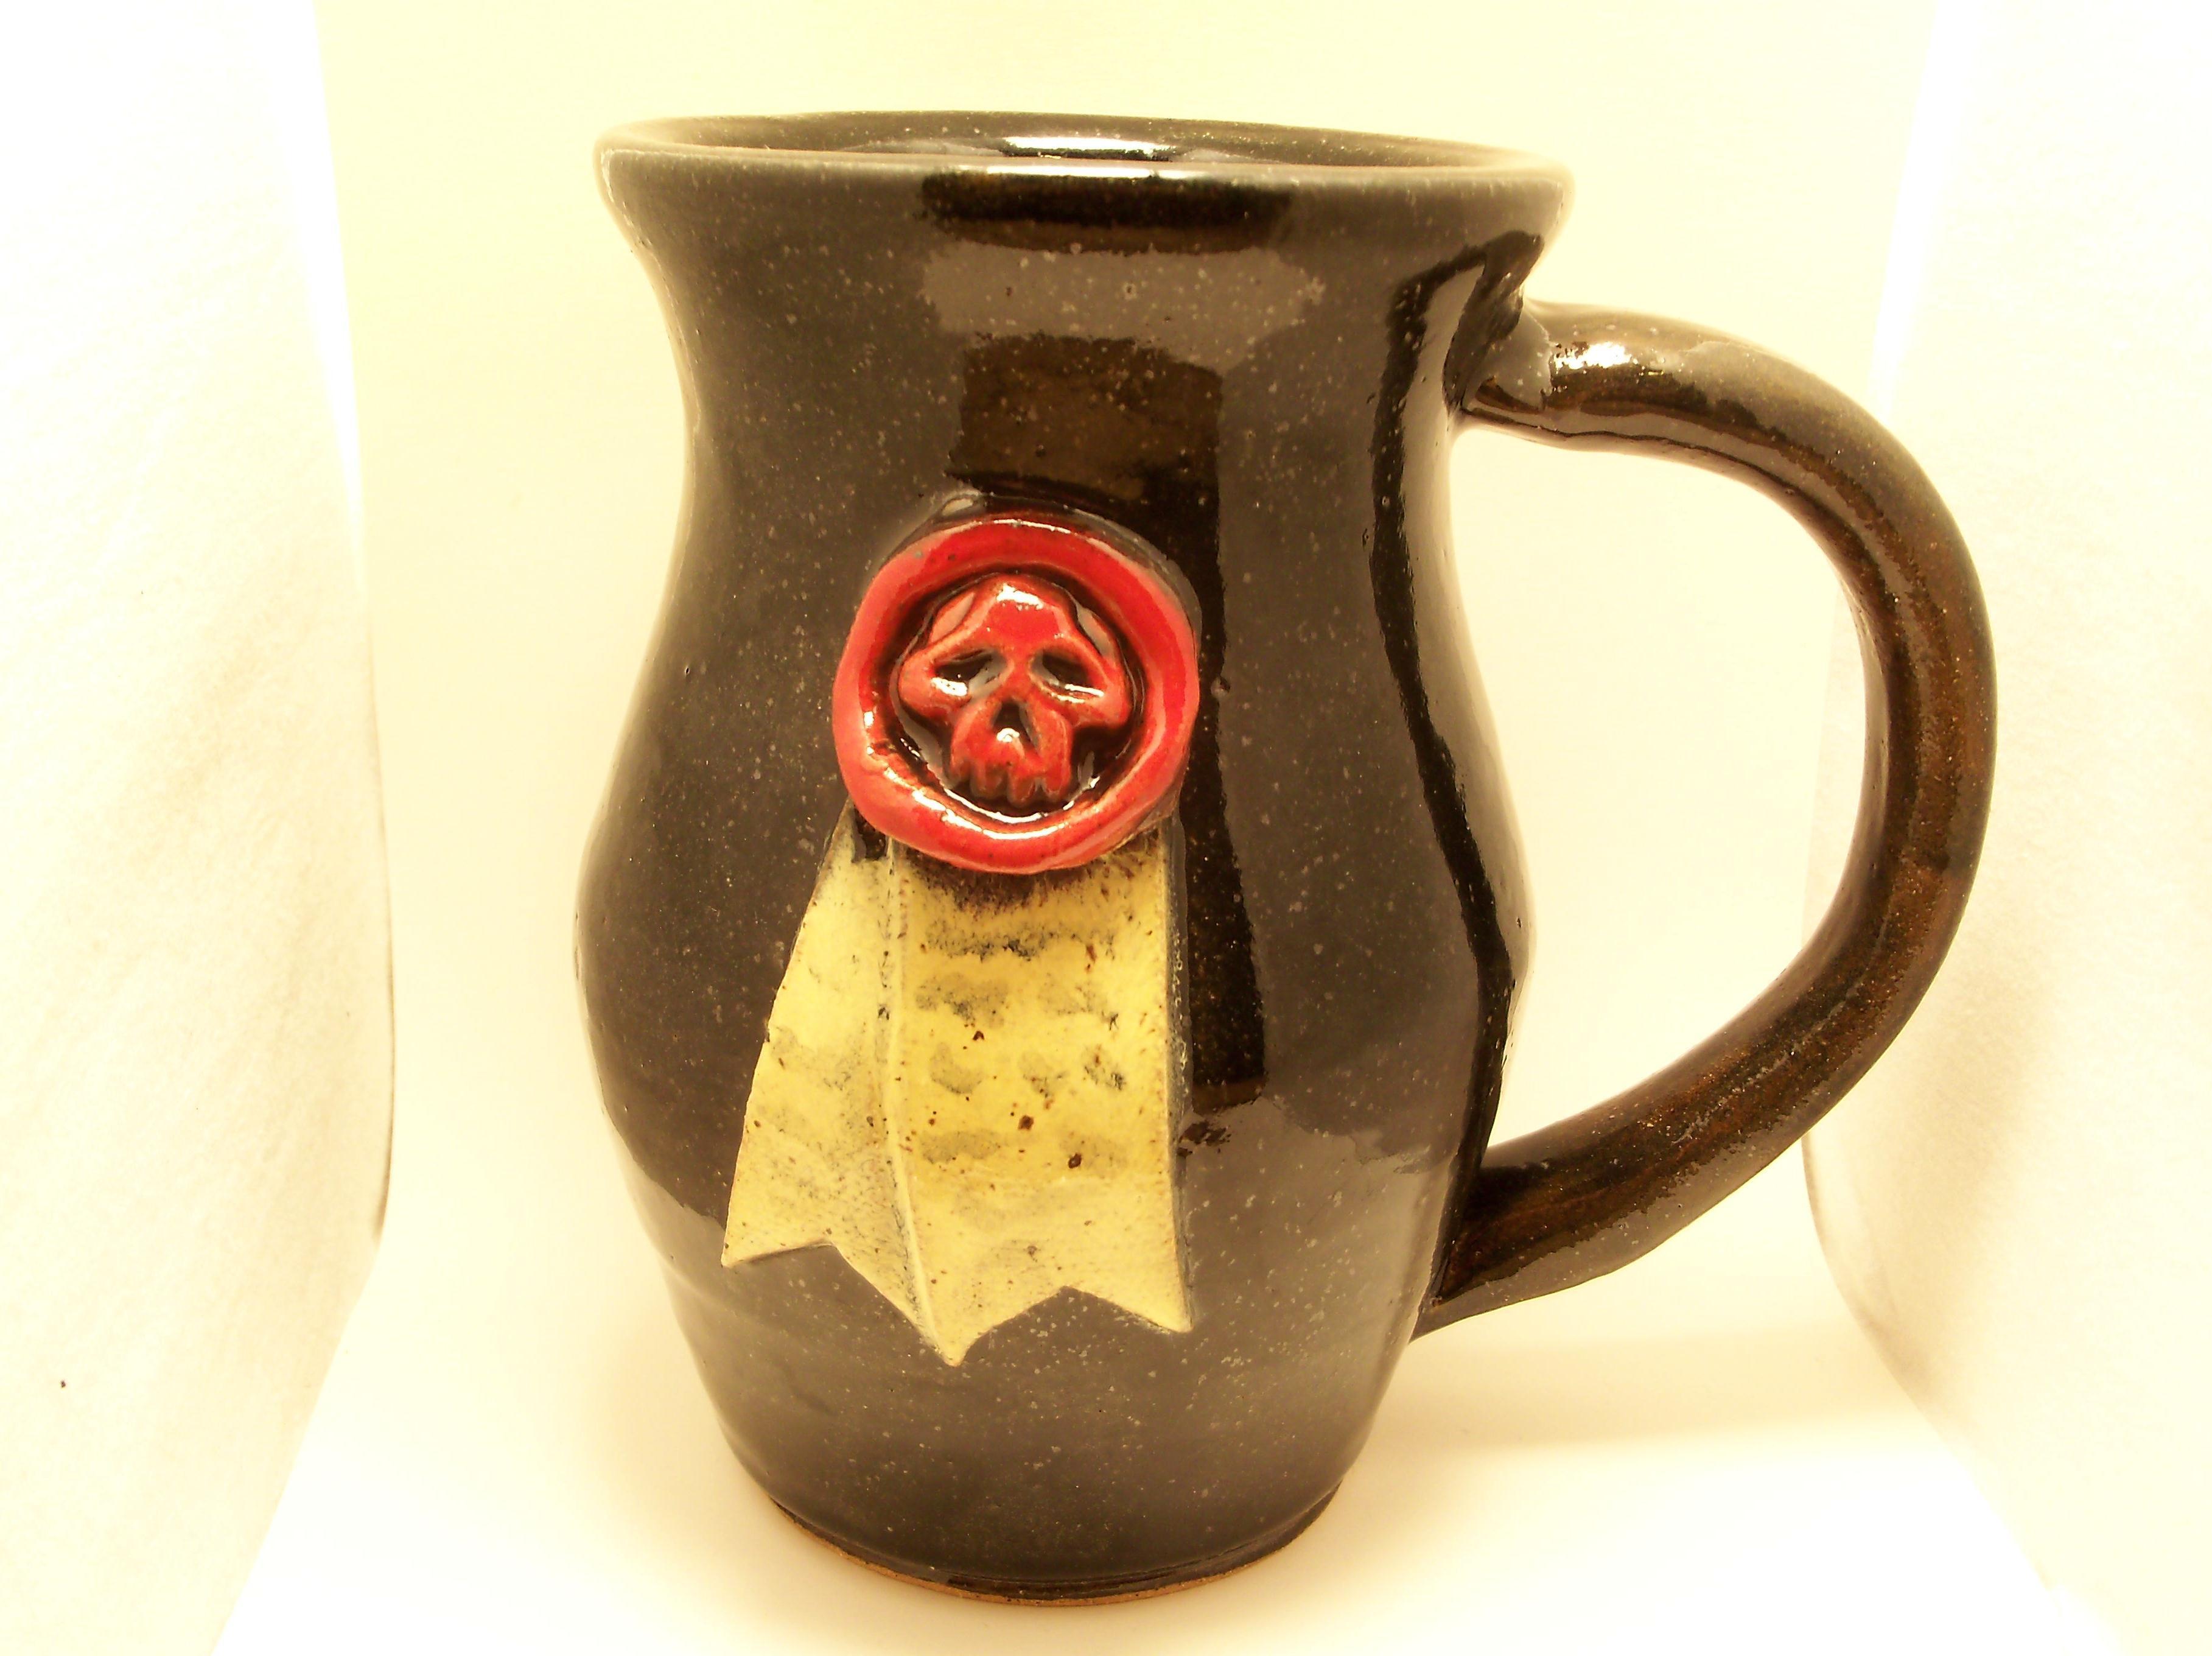 Purity Seal Beer Mug